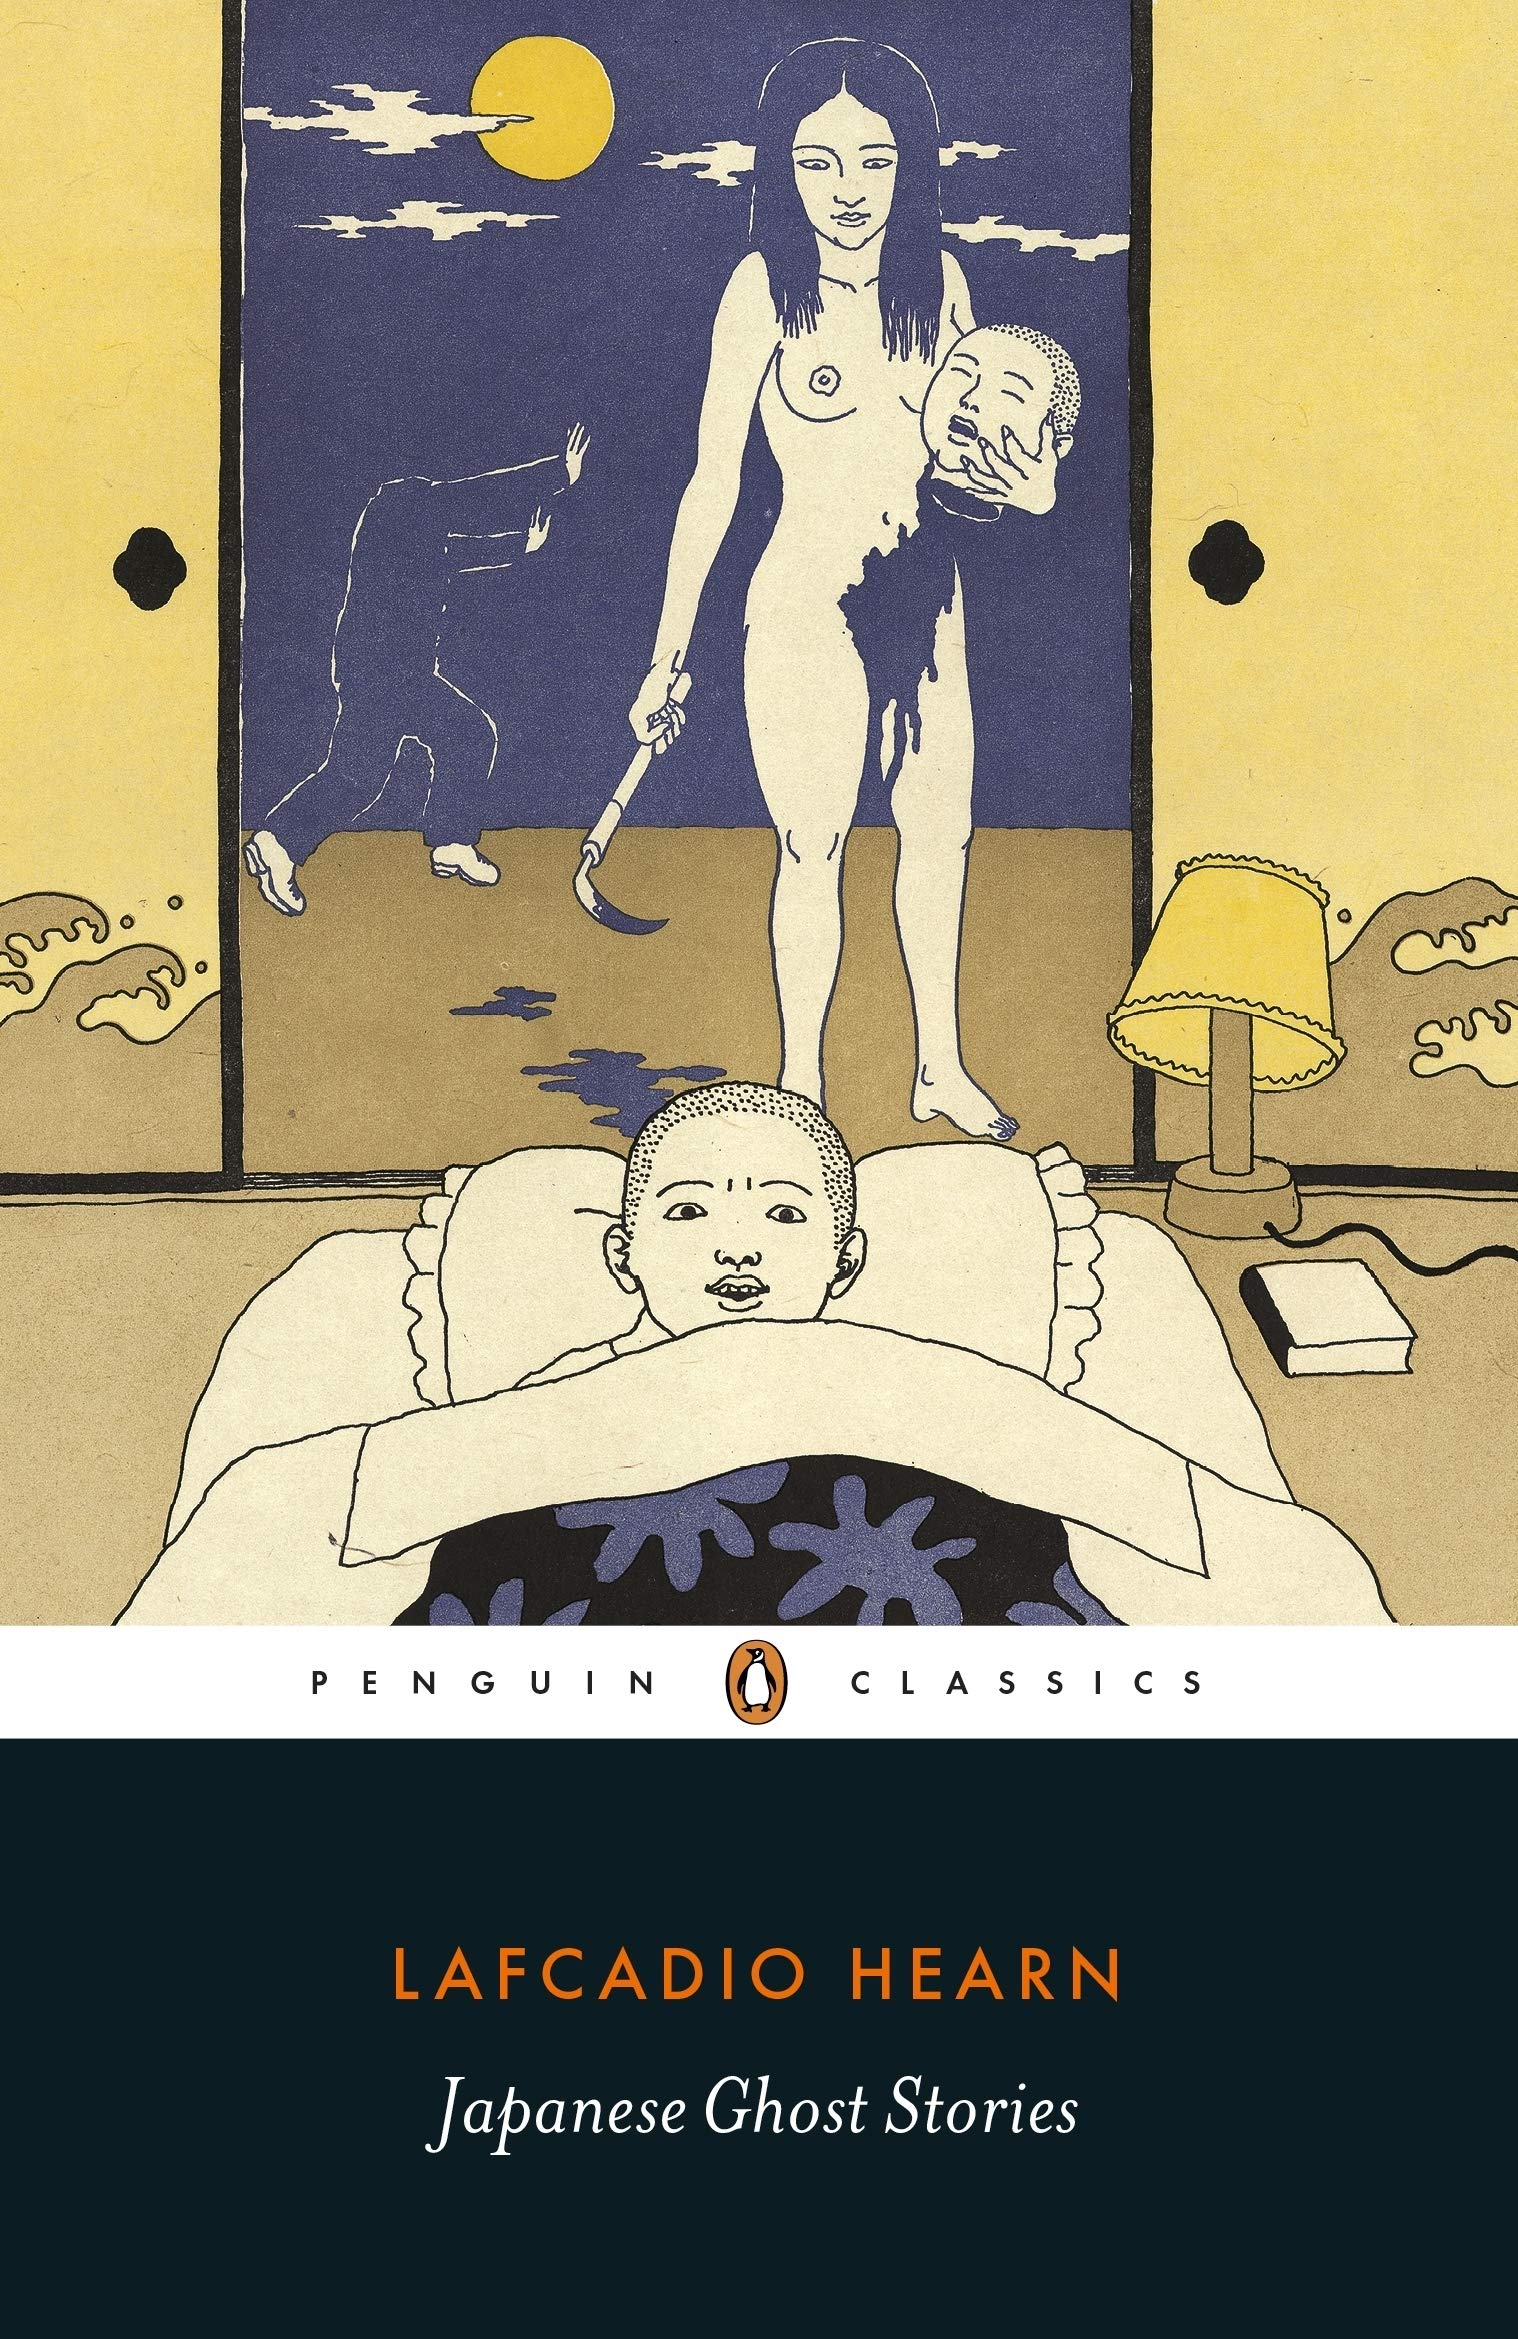 Japanese Ghost Stories (Penguin Classics)